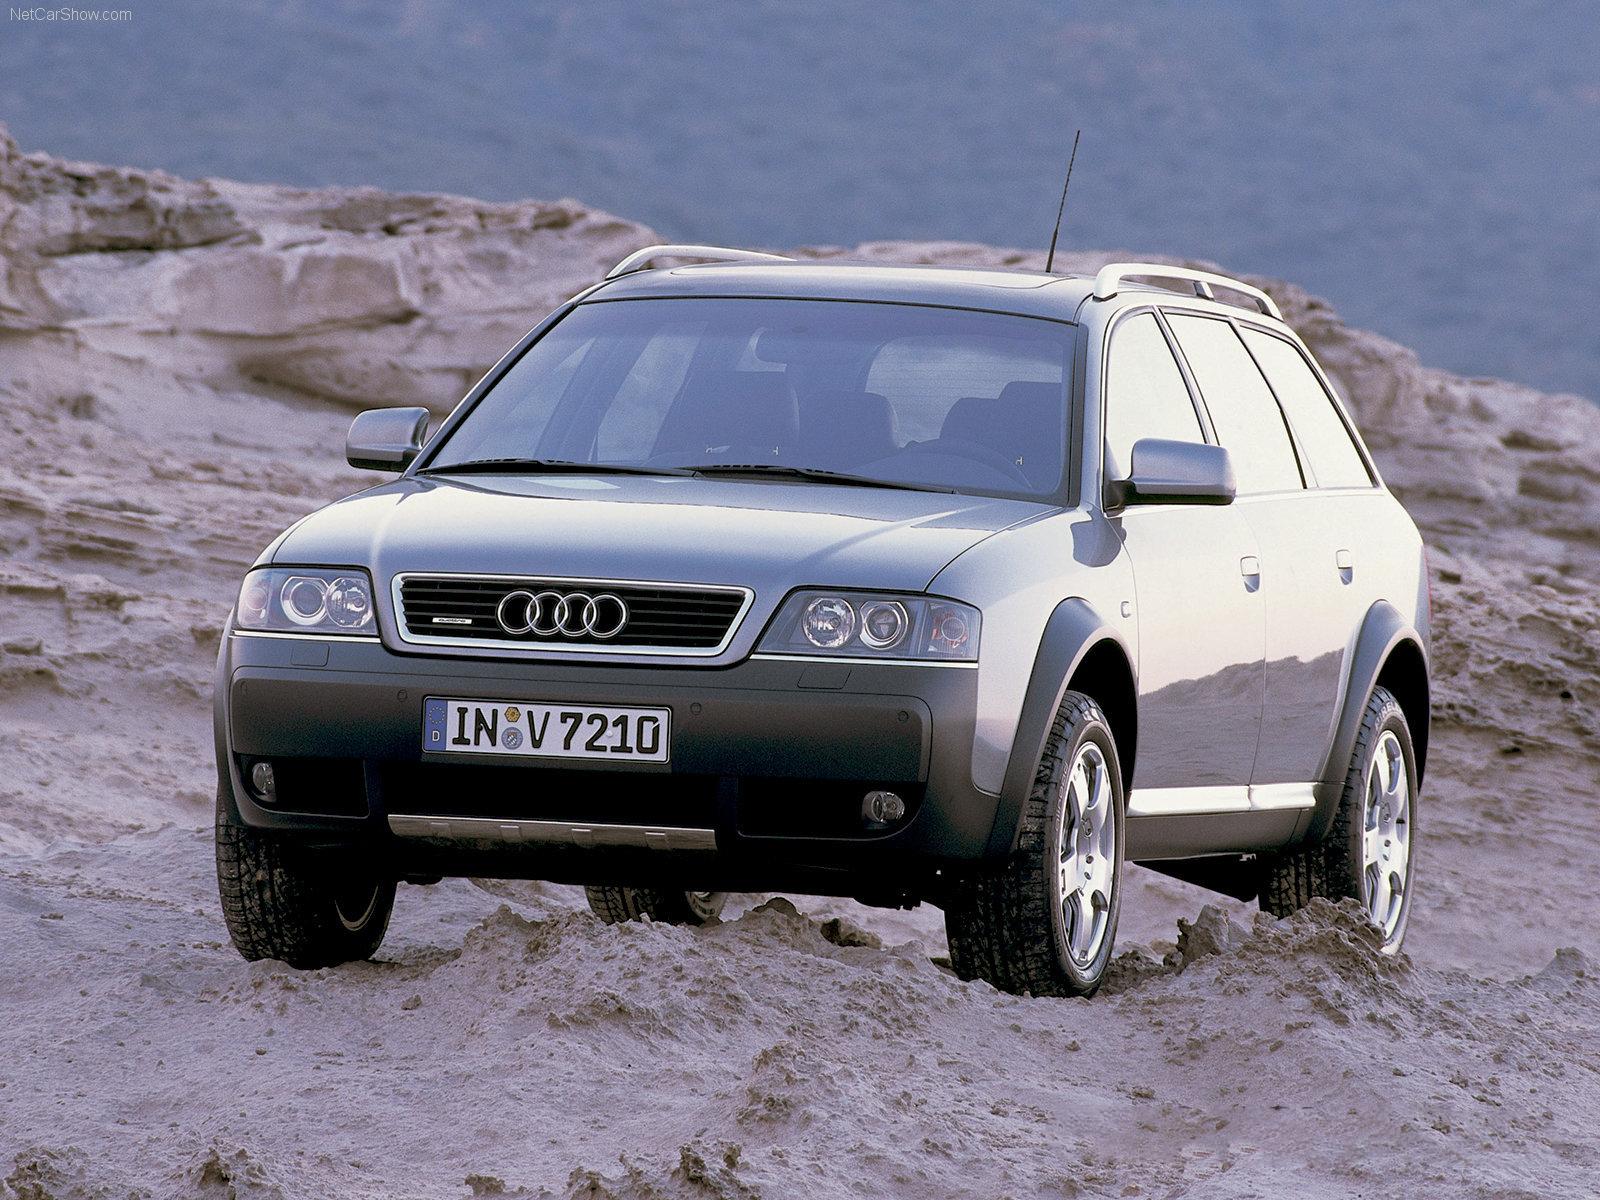 Audi allroad quattro 2 5 tdi front view